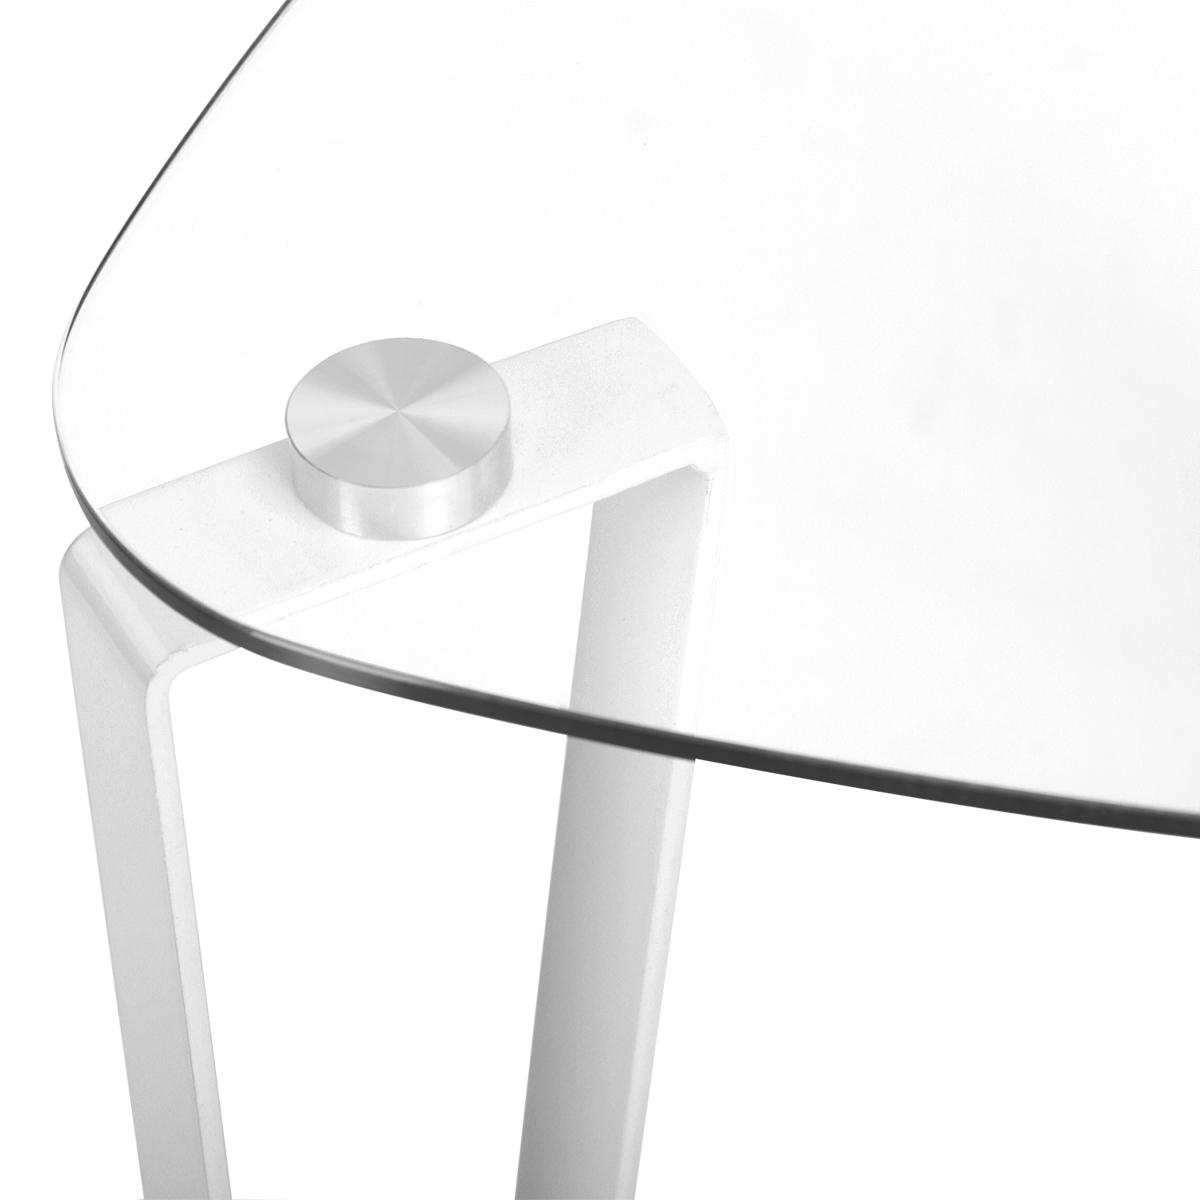 44cm-Table-basse-en-verre-trempe-Triangle-Clear-fin-de-table-Table-d-039-appoint